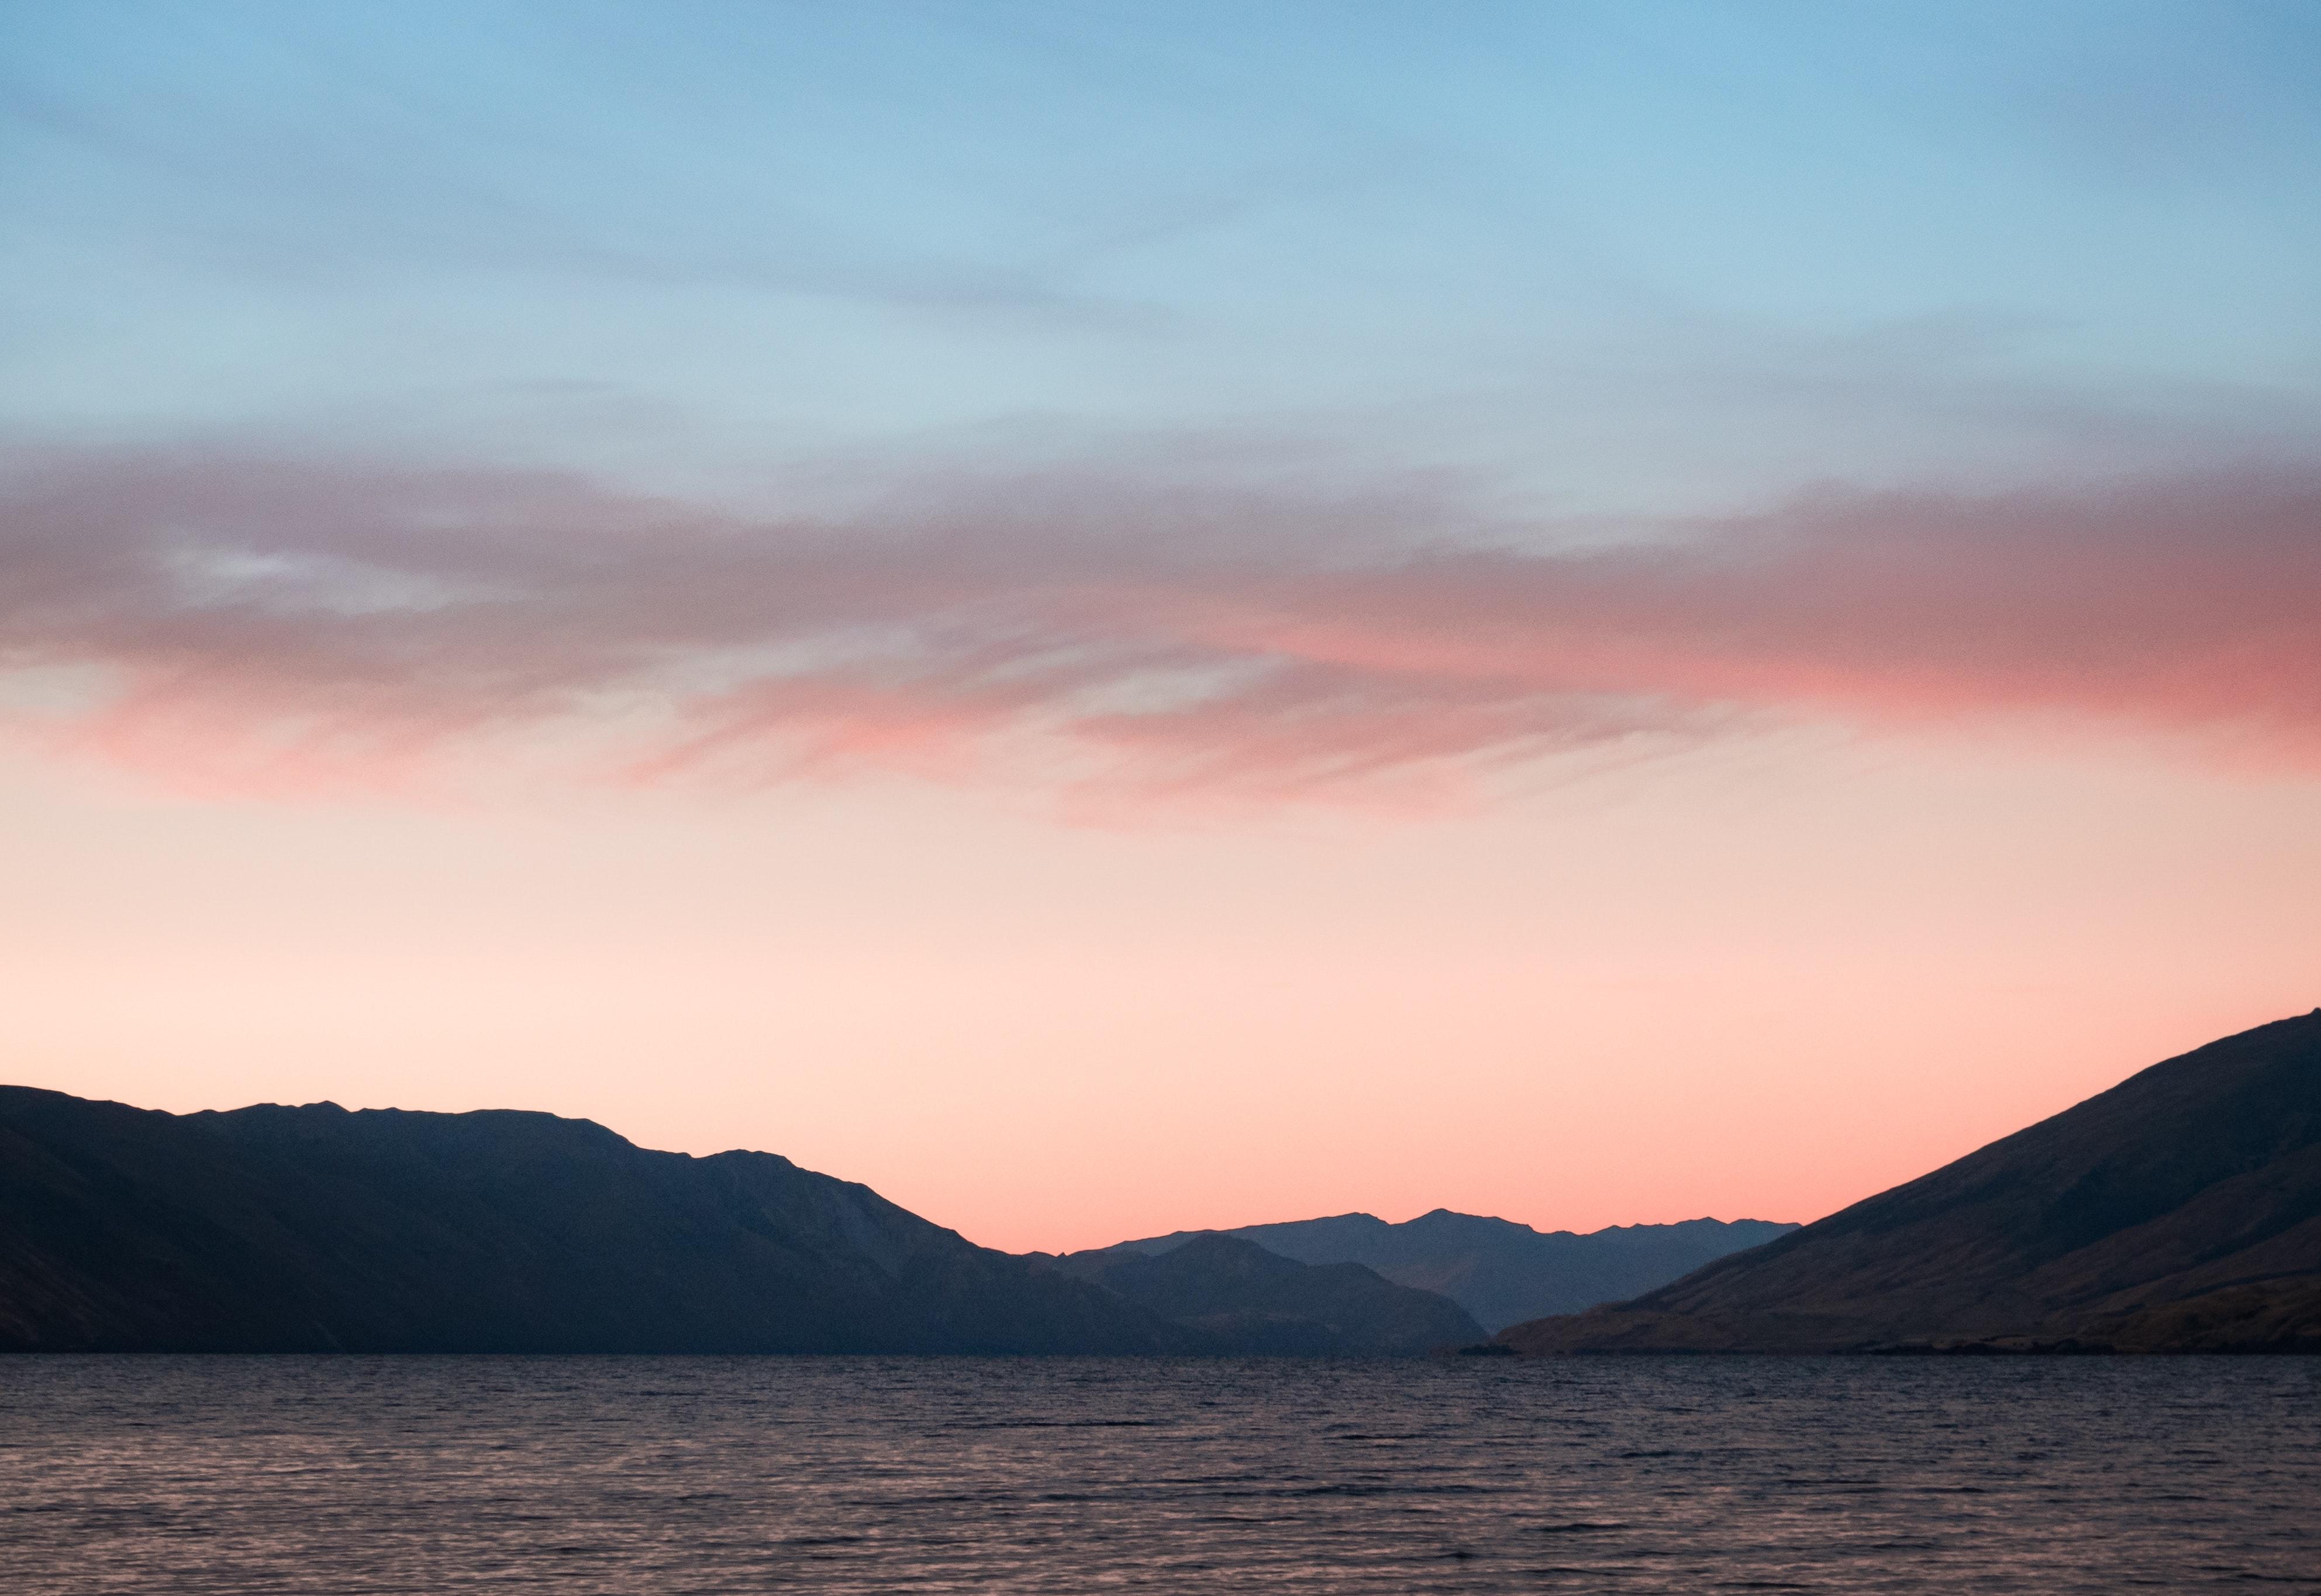 Sky Wallpapers: Orange Blue Cloudy Sky · Free Stock Photo